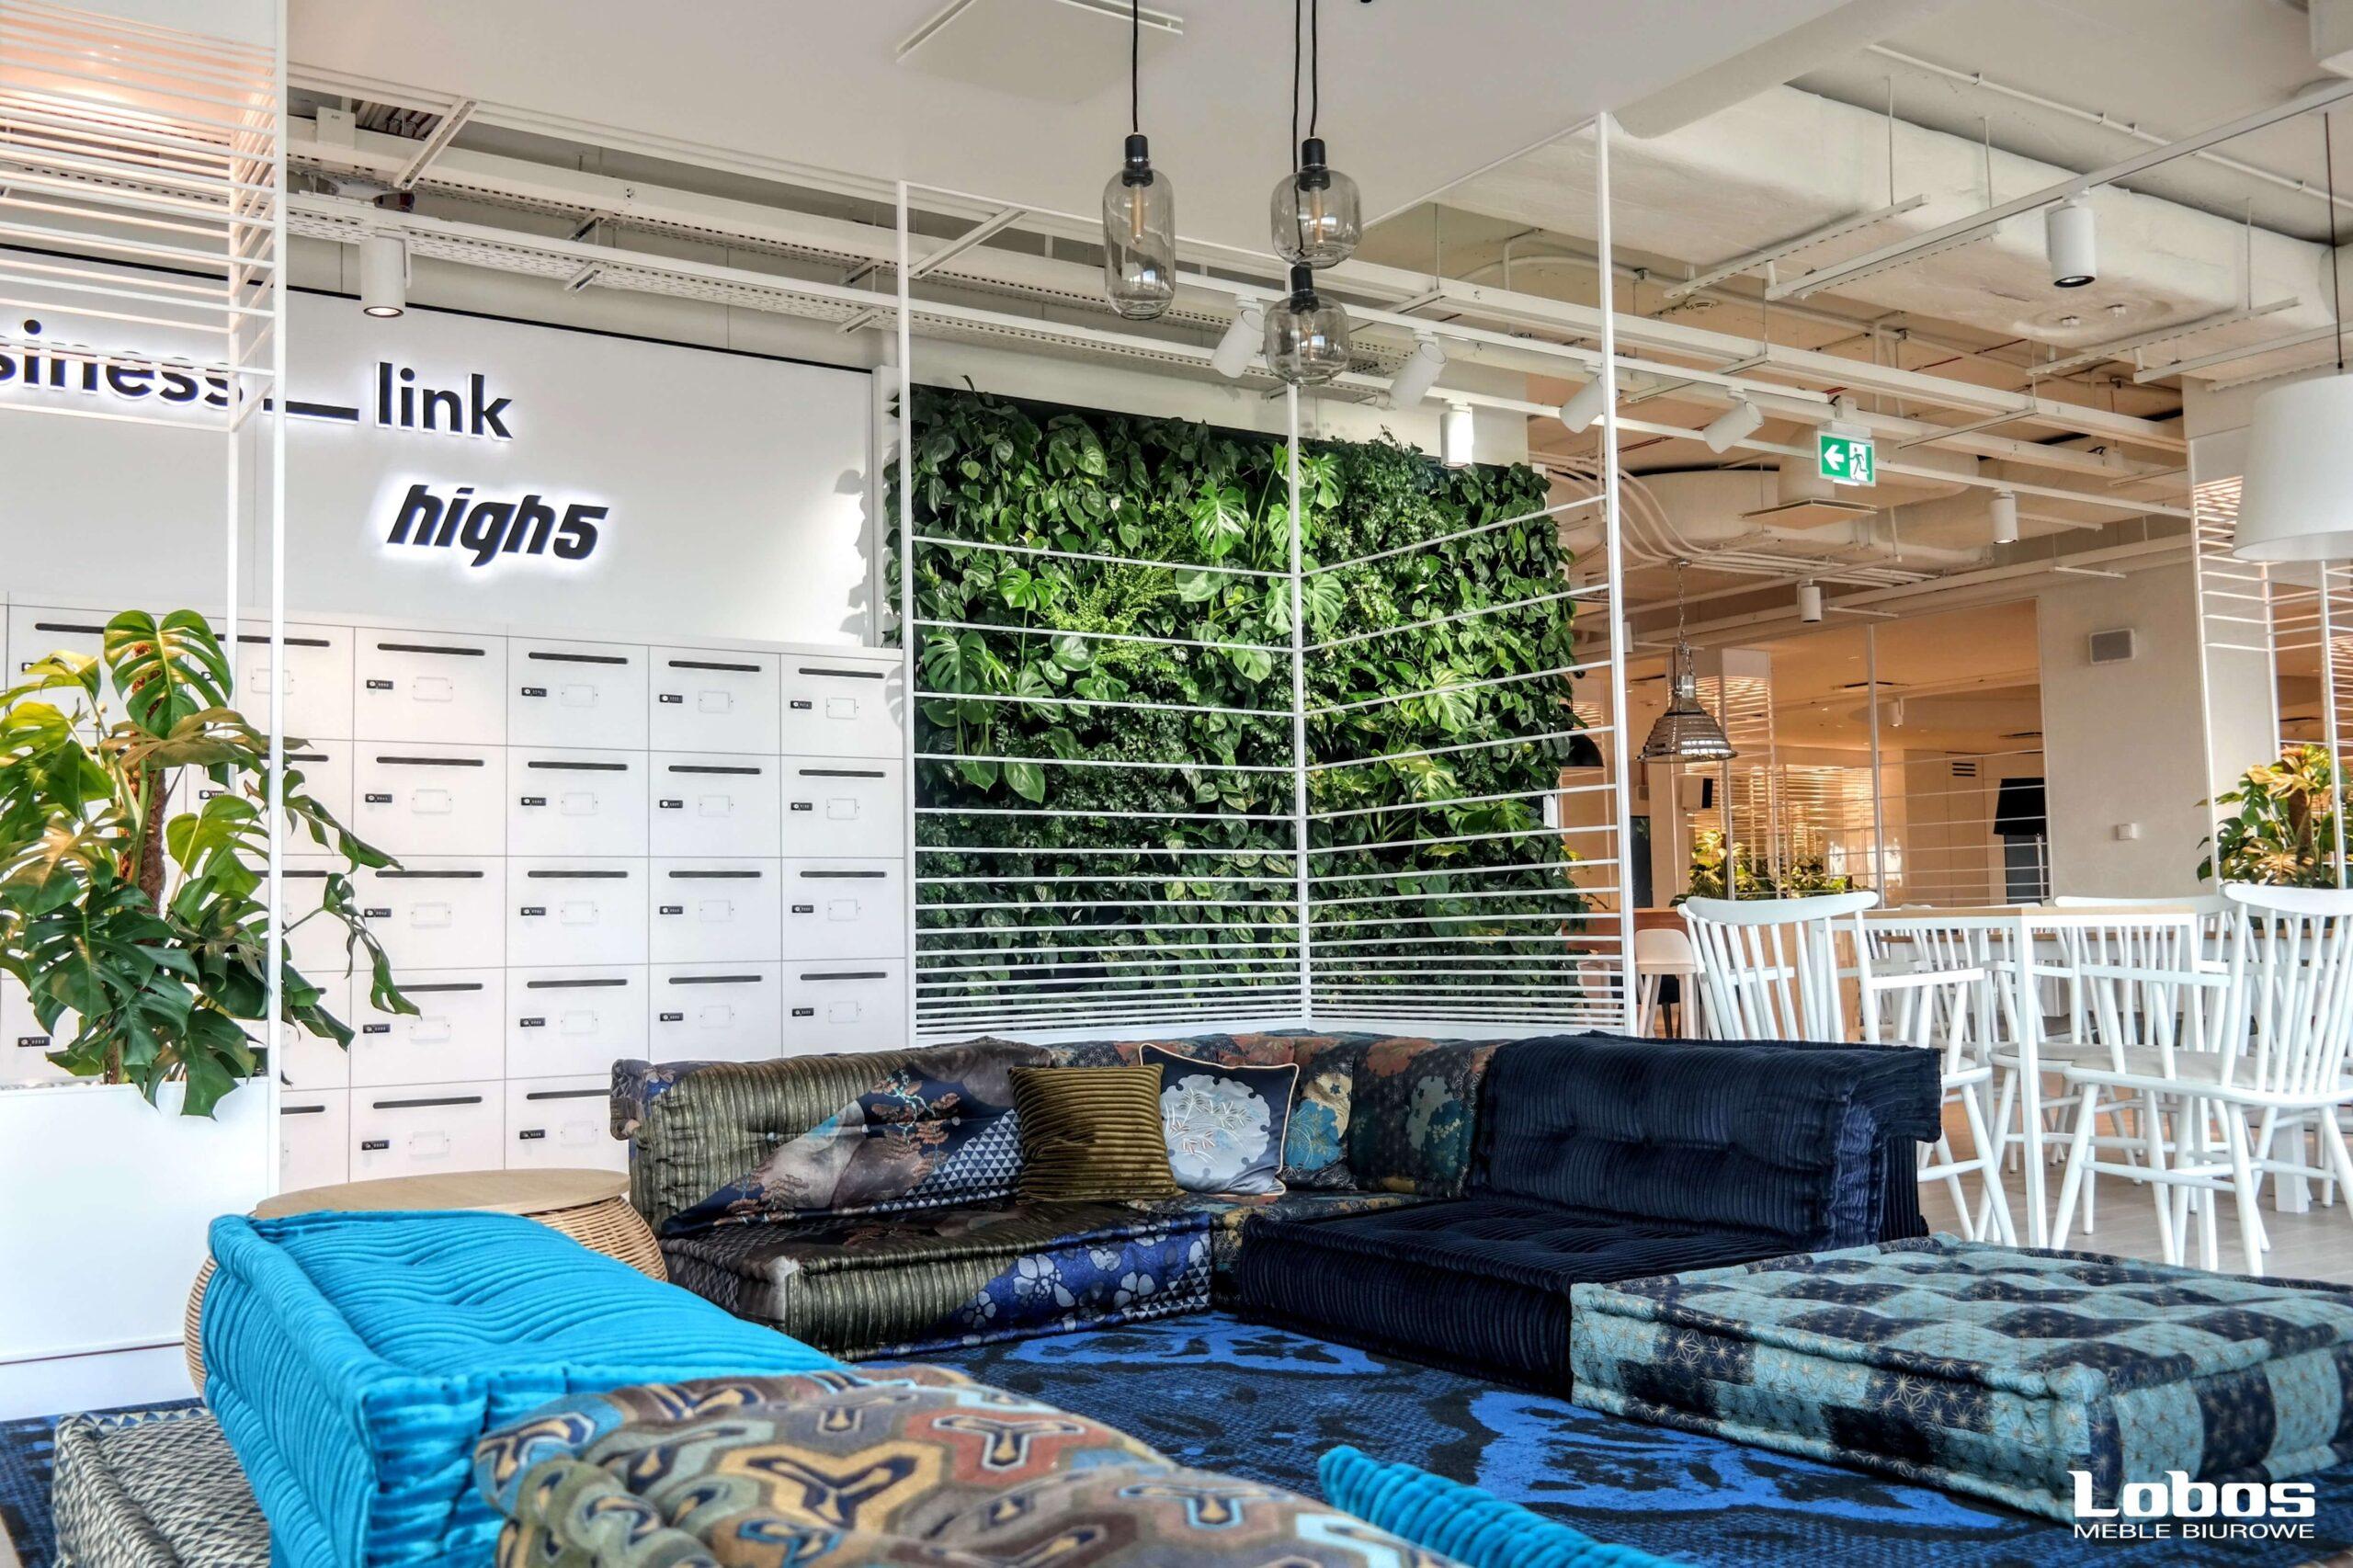 BUSINESS LINK HIGH5